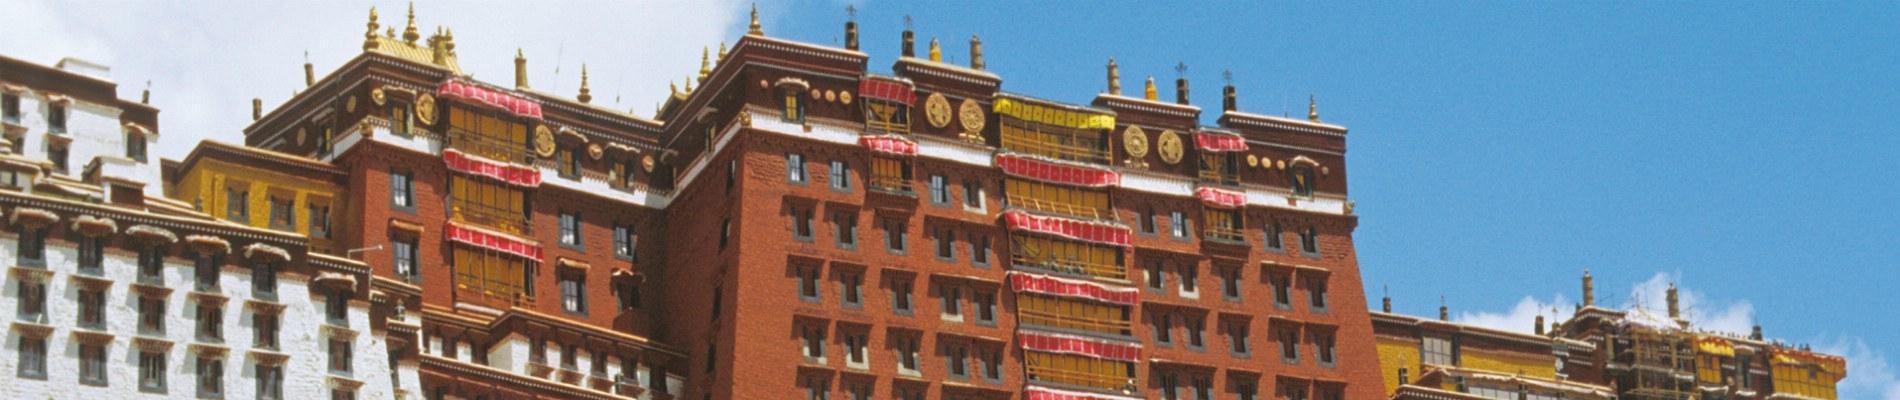 tibet individualreisen